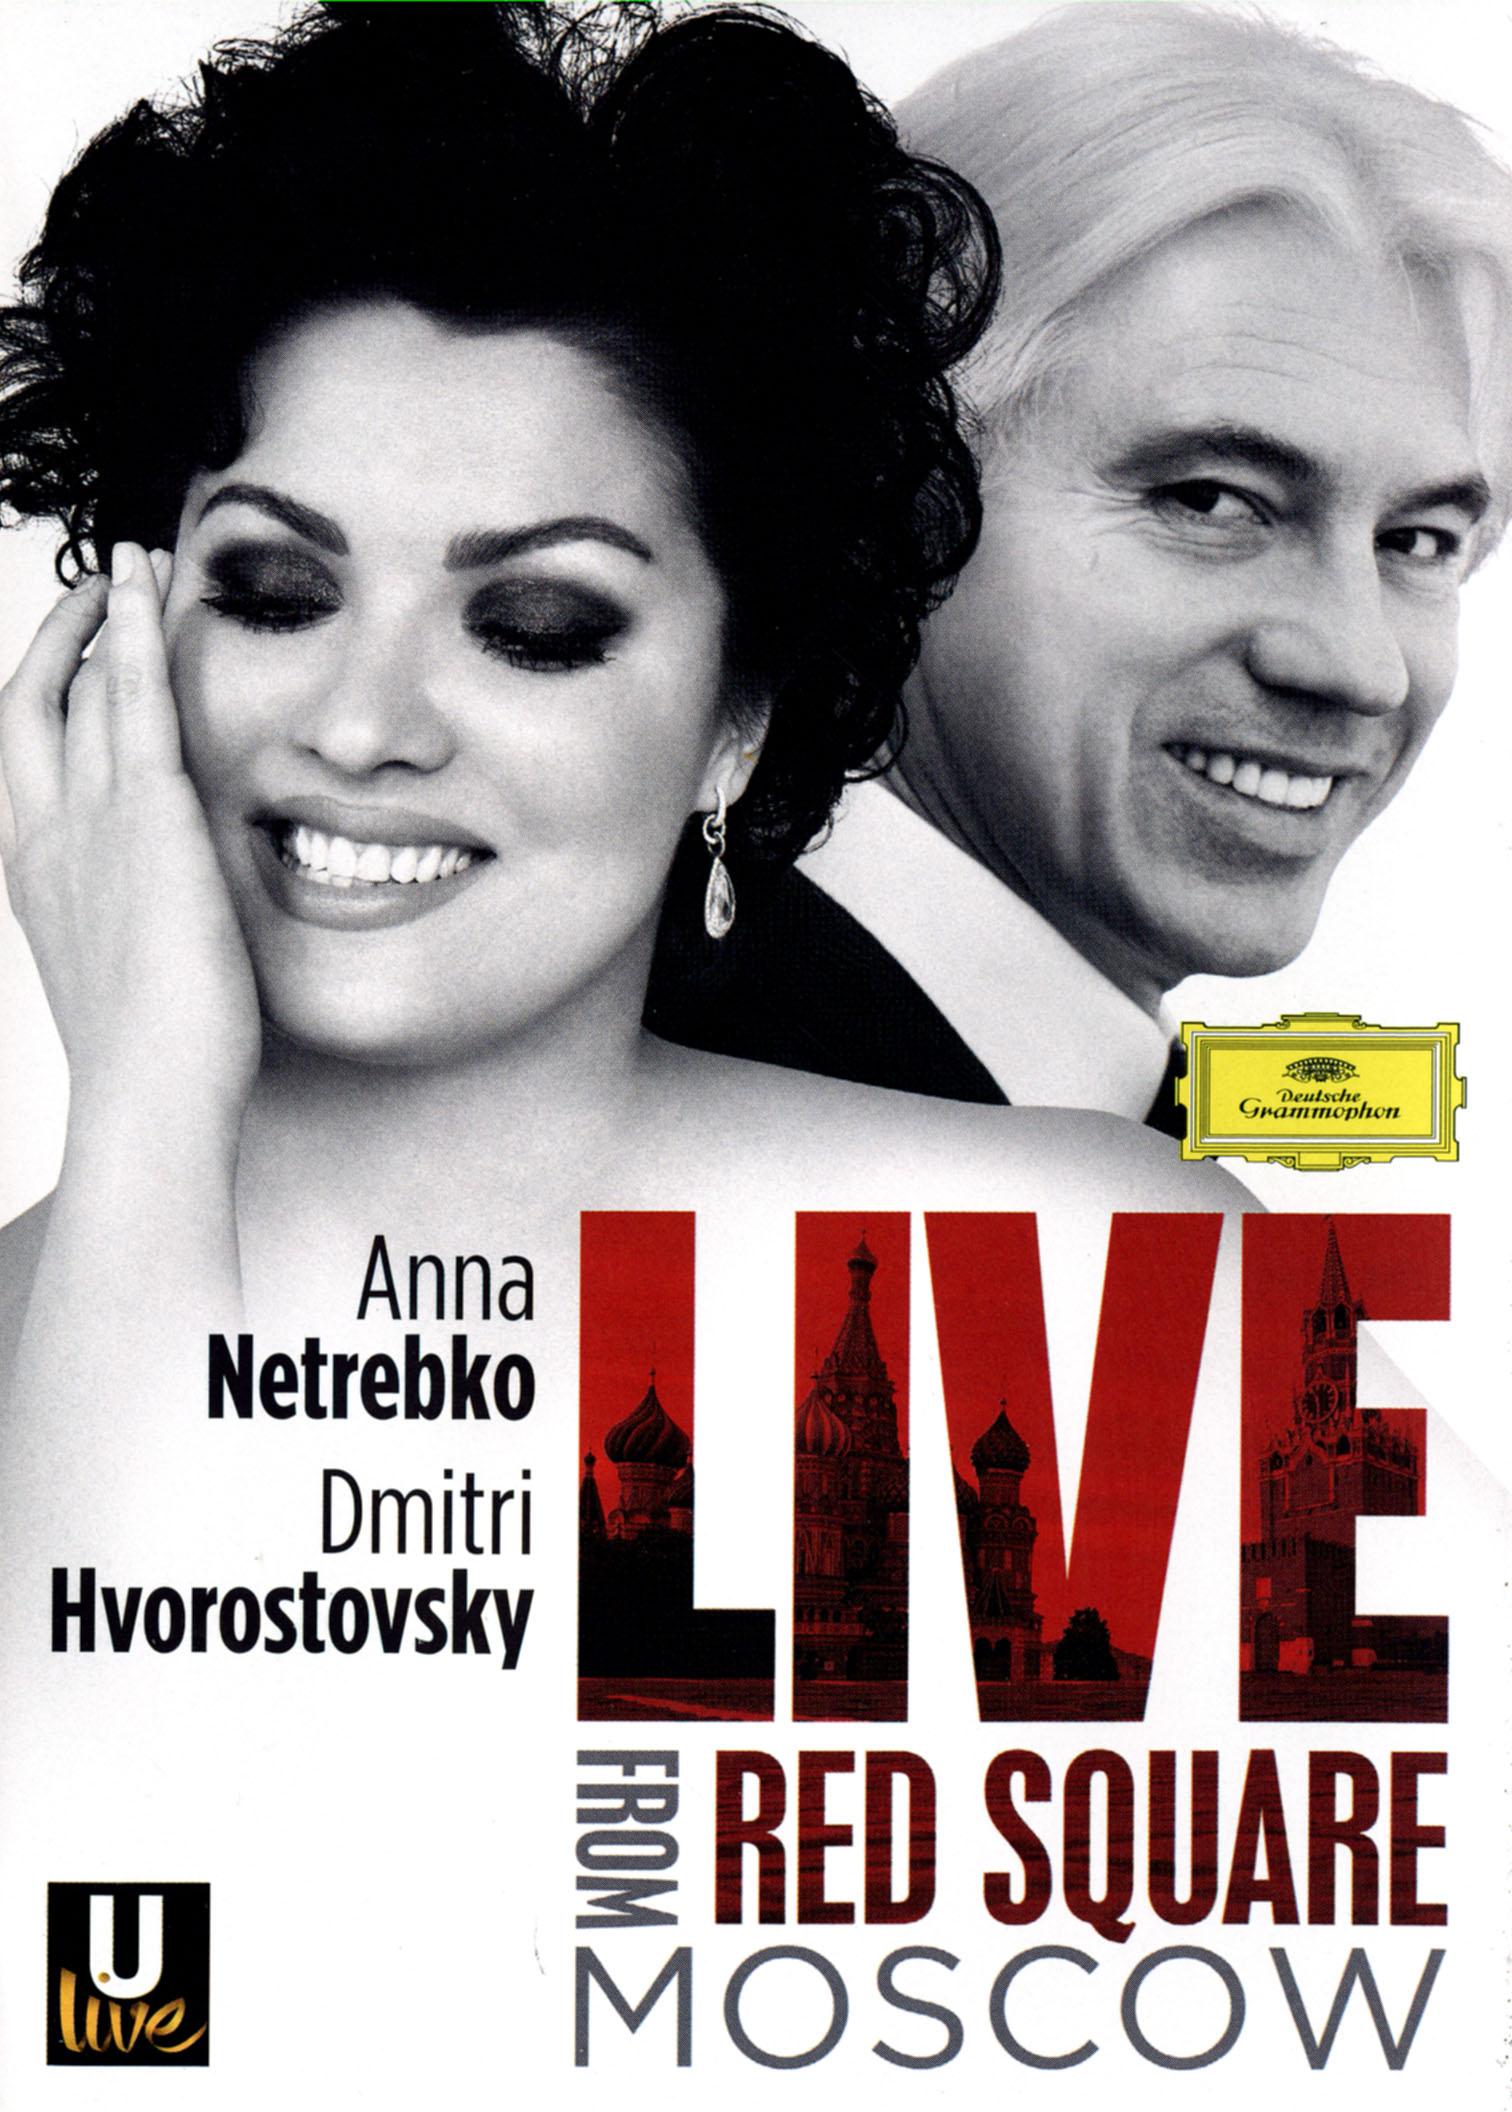 Anna Netrebko/Dmitri Hvorostovsky: Live from Red Square Moscow